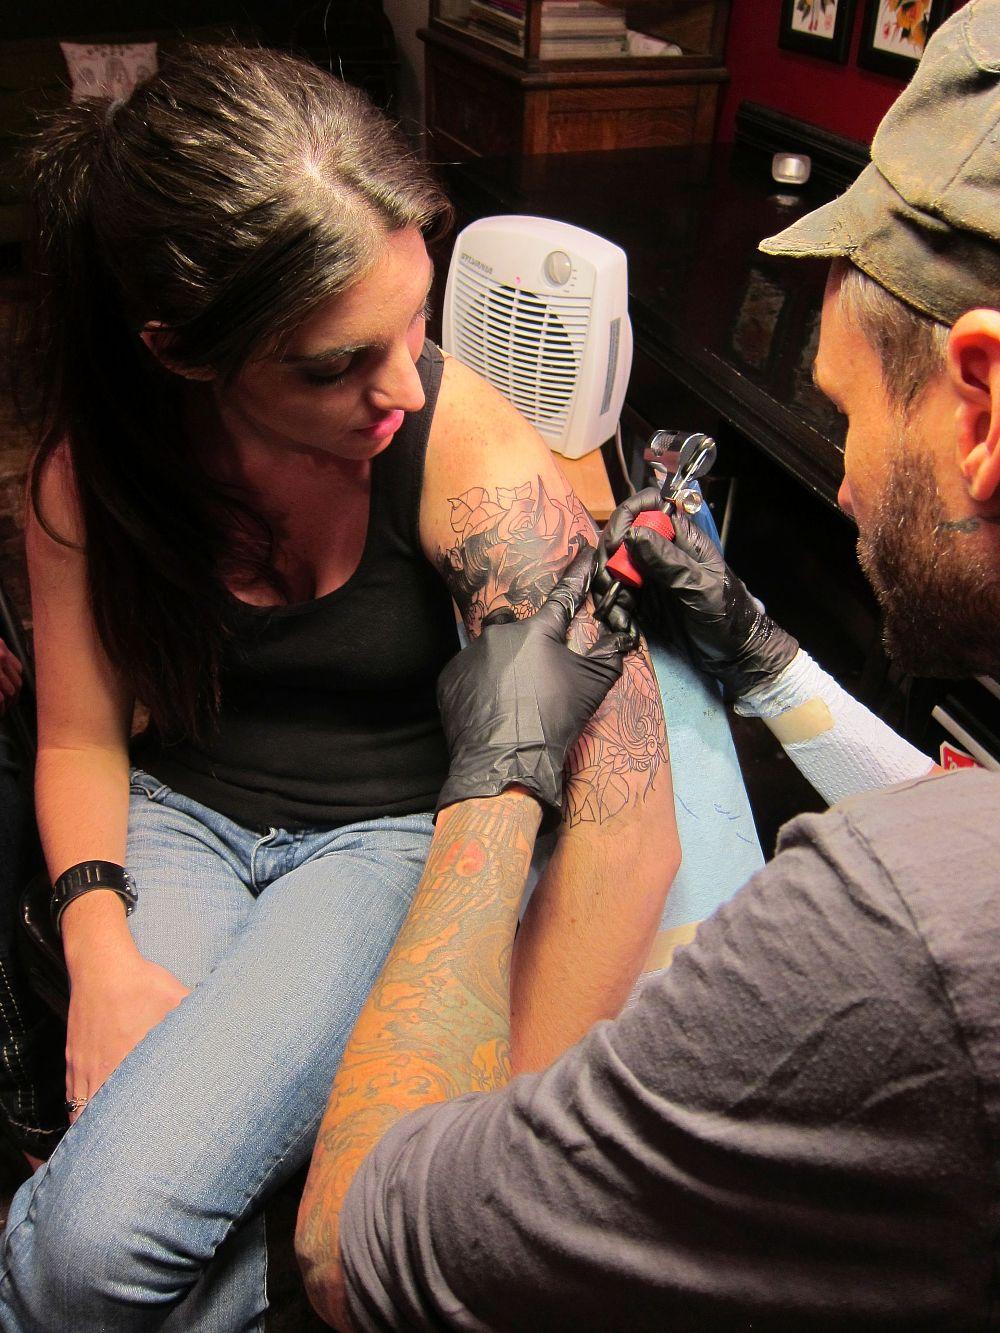 Najgorsze Tatuaże Ameryki Odcinek 7 Tatuaż Pod Wpływem